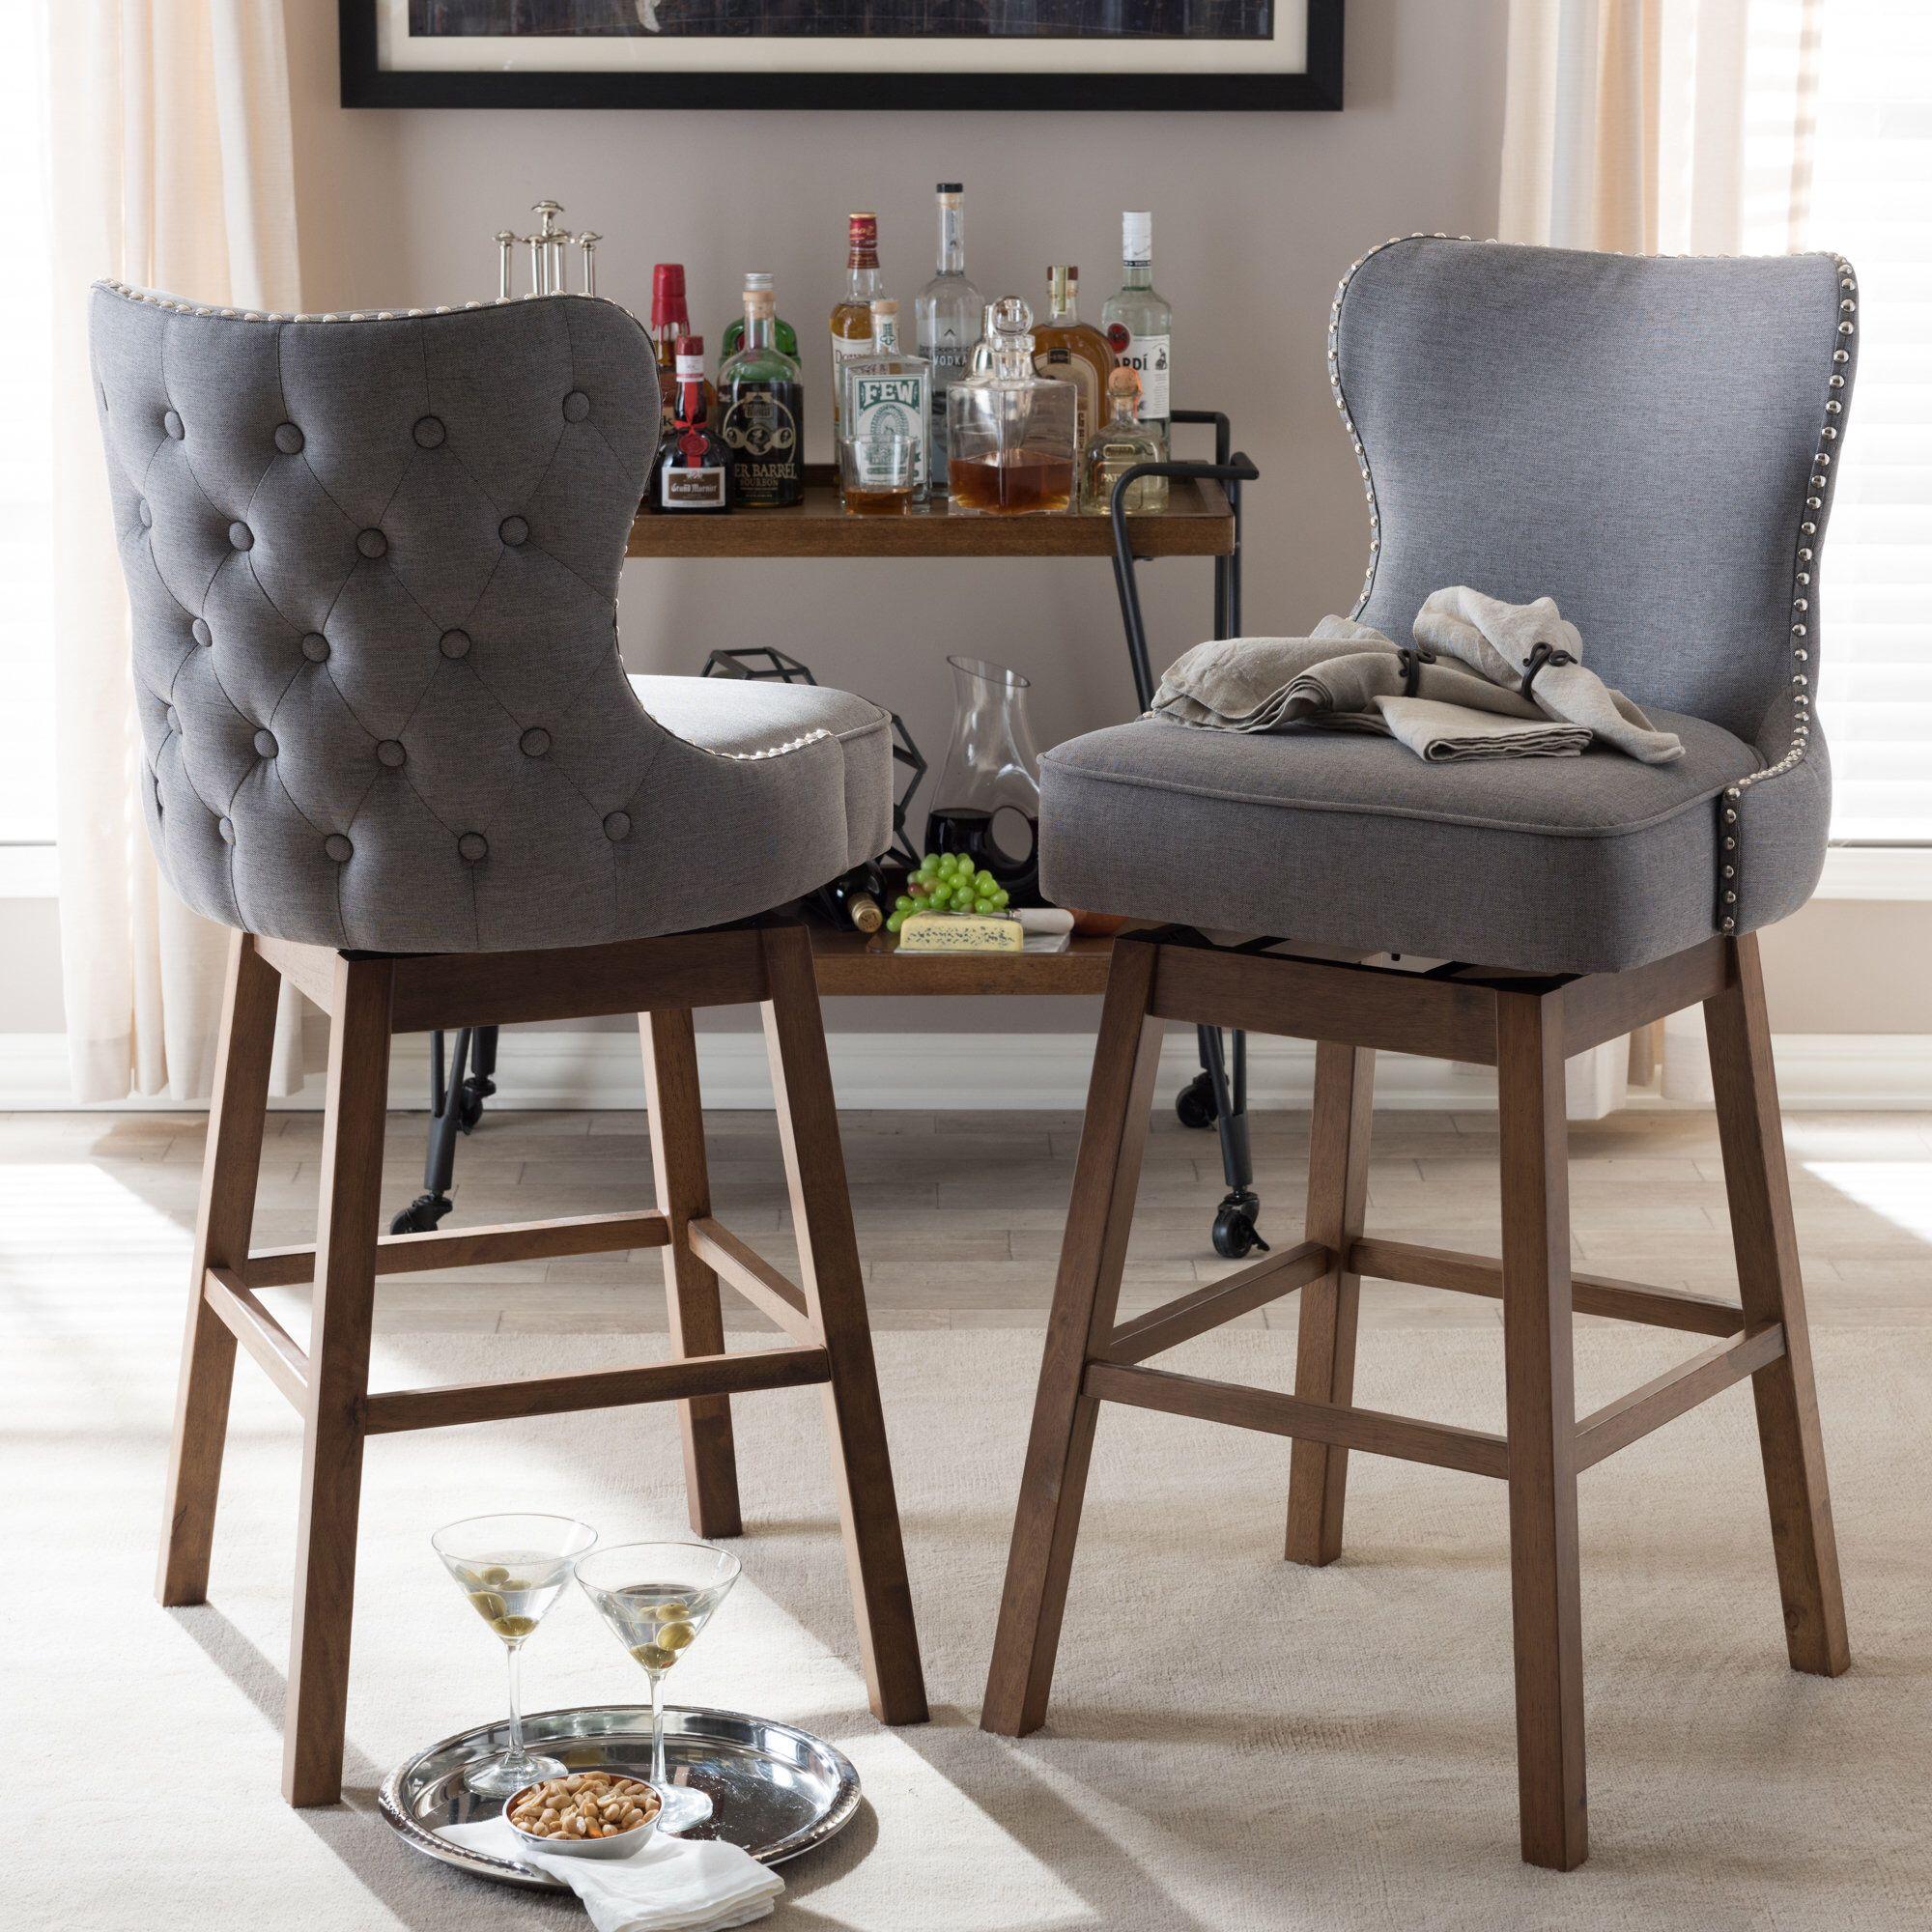 Pleasing Alfson 31 Bar Stool Home Bar Stools Swivel Bar Stools Creativecarmelina Interior Chair Design Creativecarmelinacom